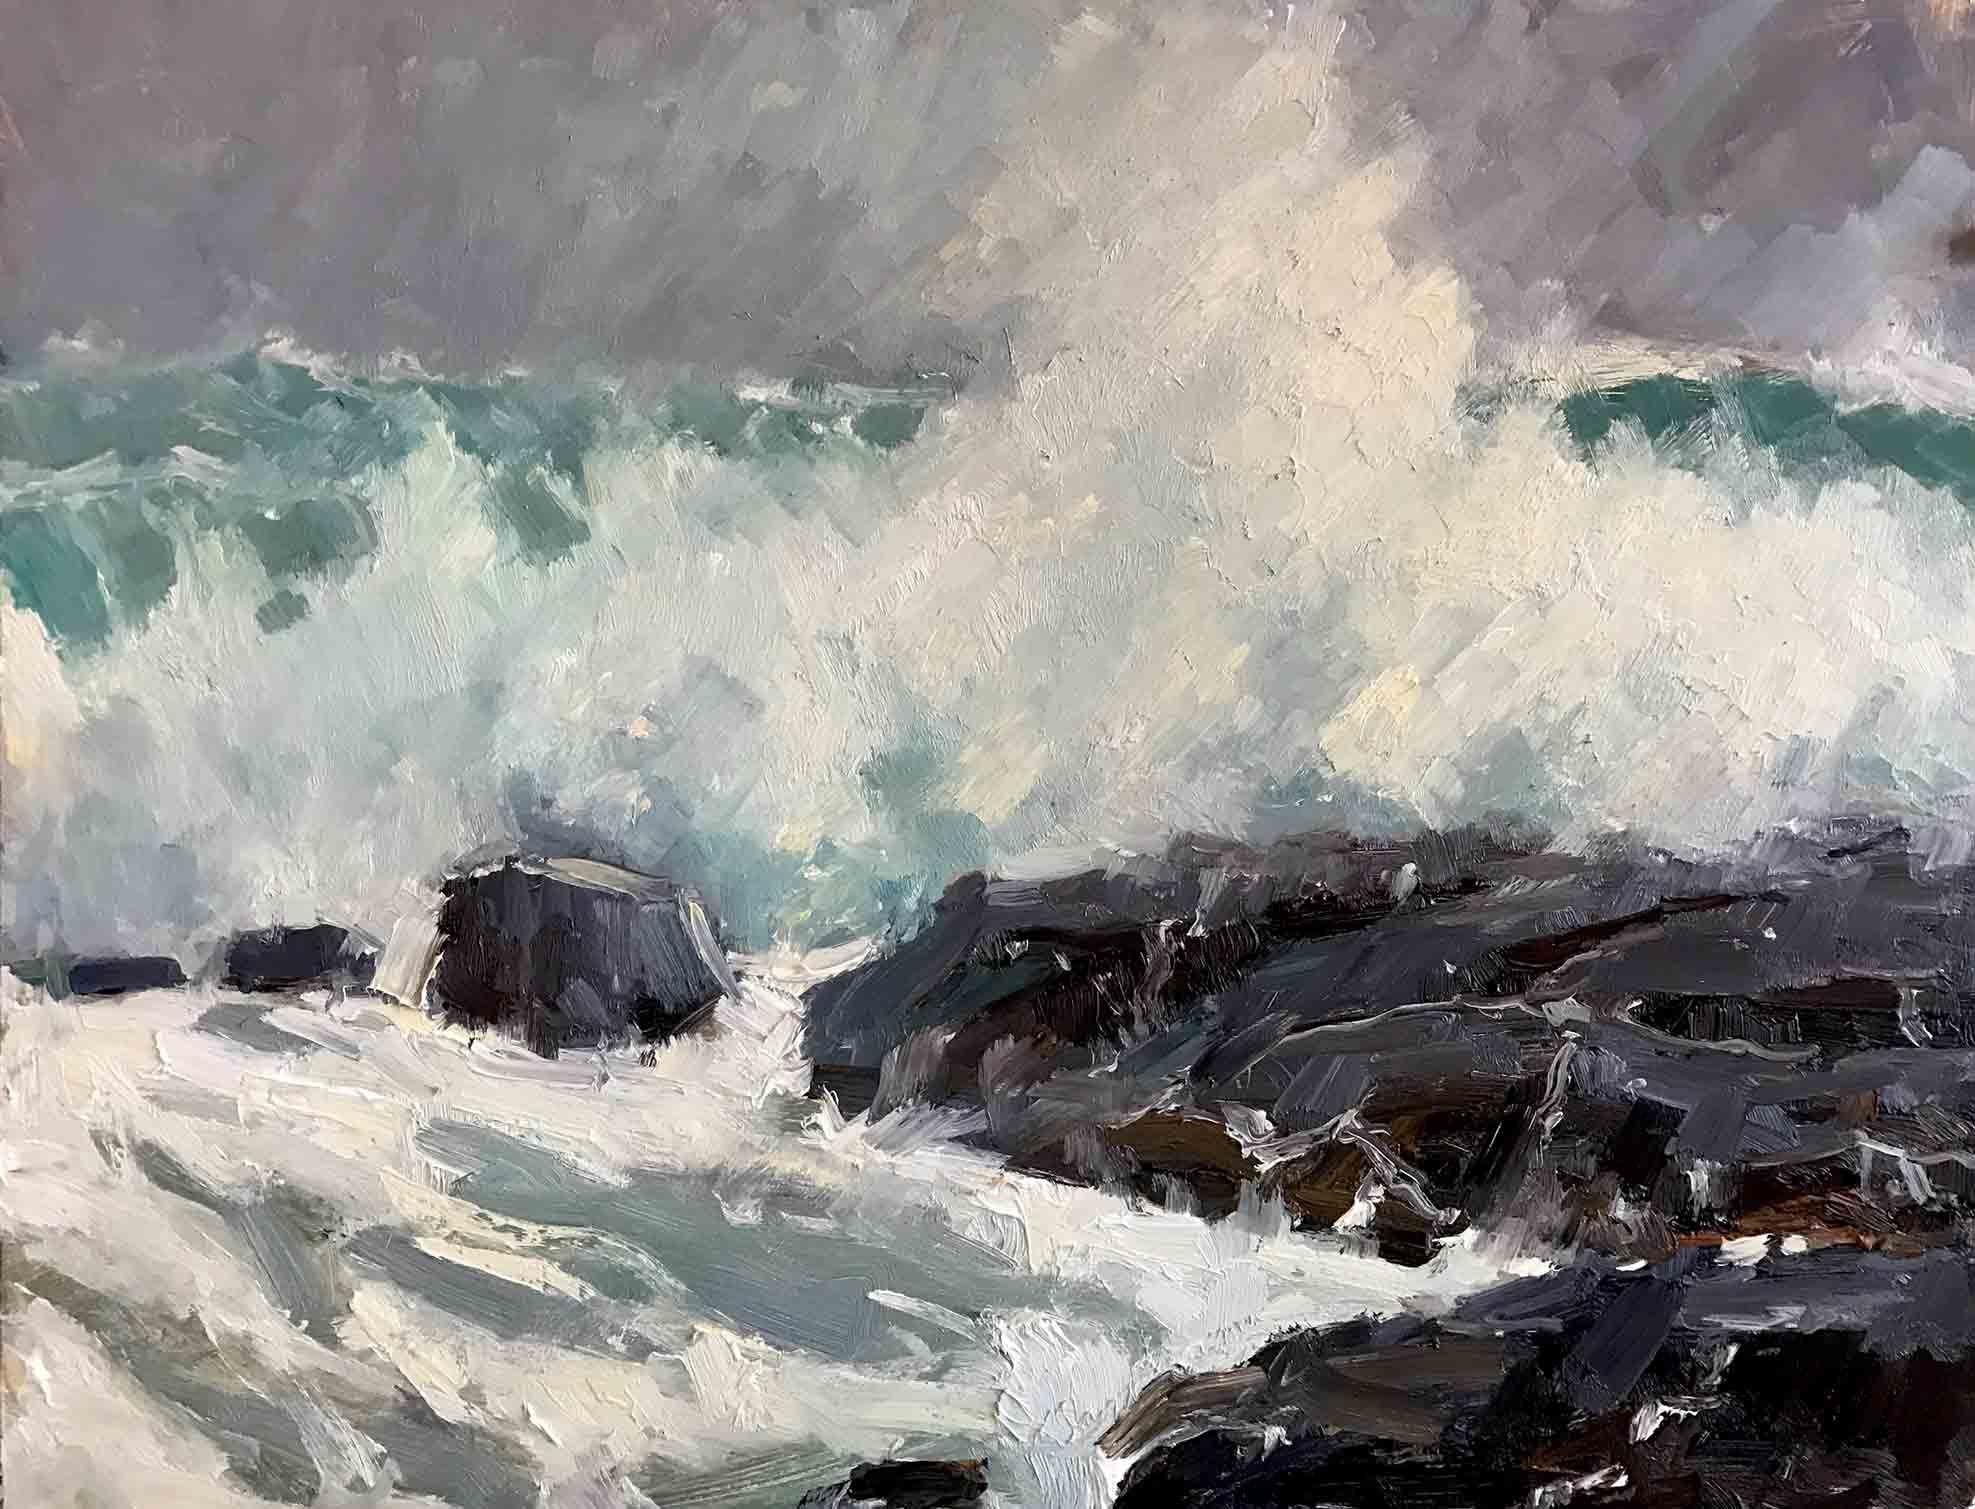 Surf-Spray-on-the-Rocks_web.jpg